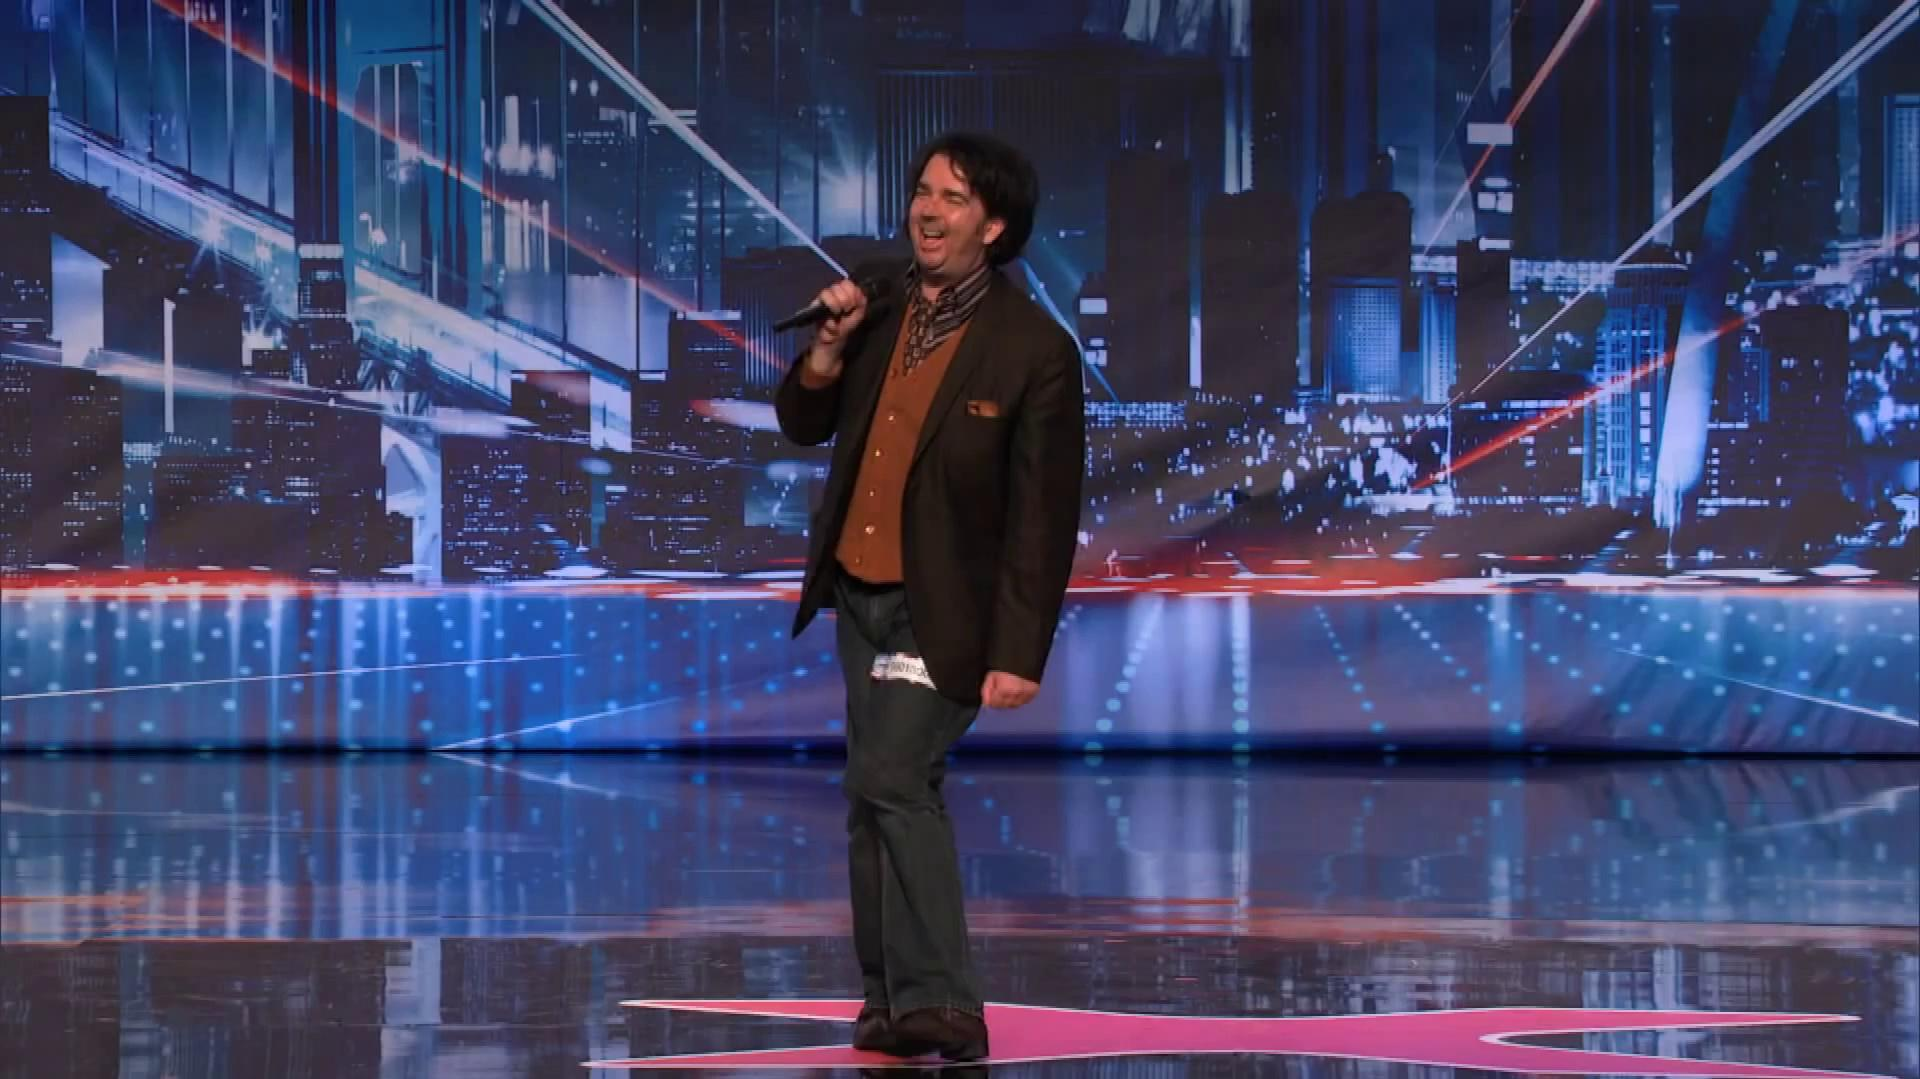 America's_Got_Talent_2013_-_Season_8_-_092_-_Kevin_Downey_Jr._-_Comedian_Who_Looks_Like_He_Has_to_Pee